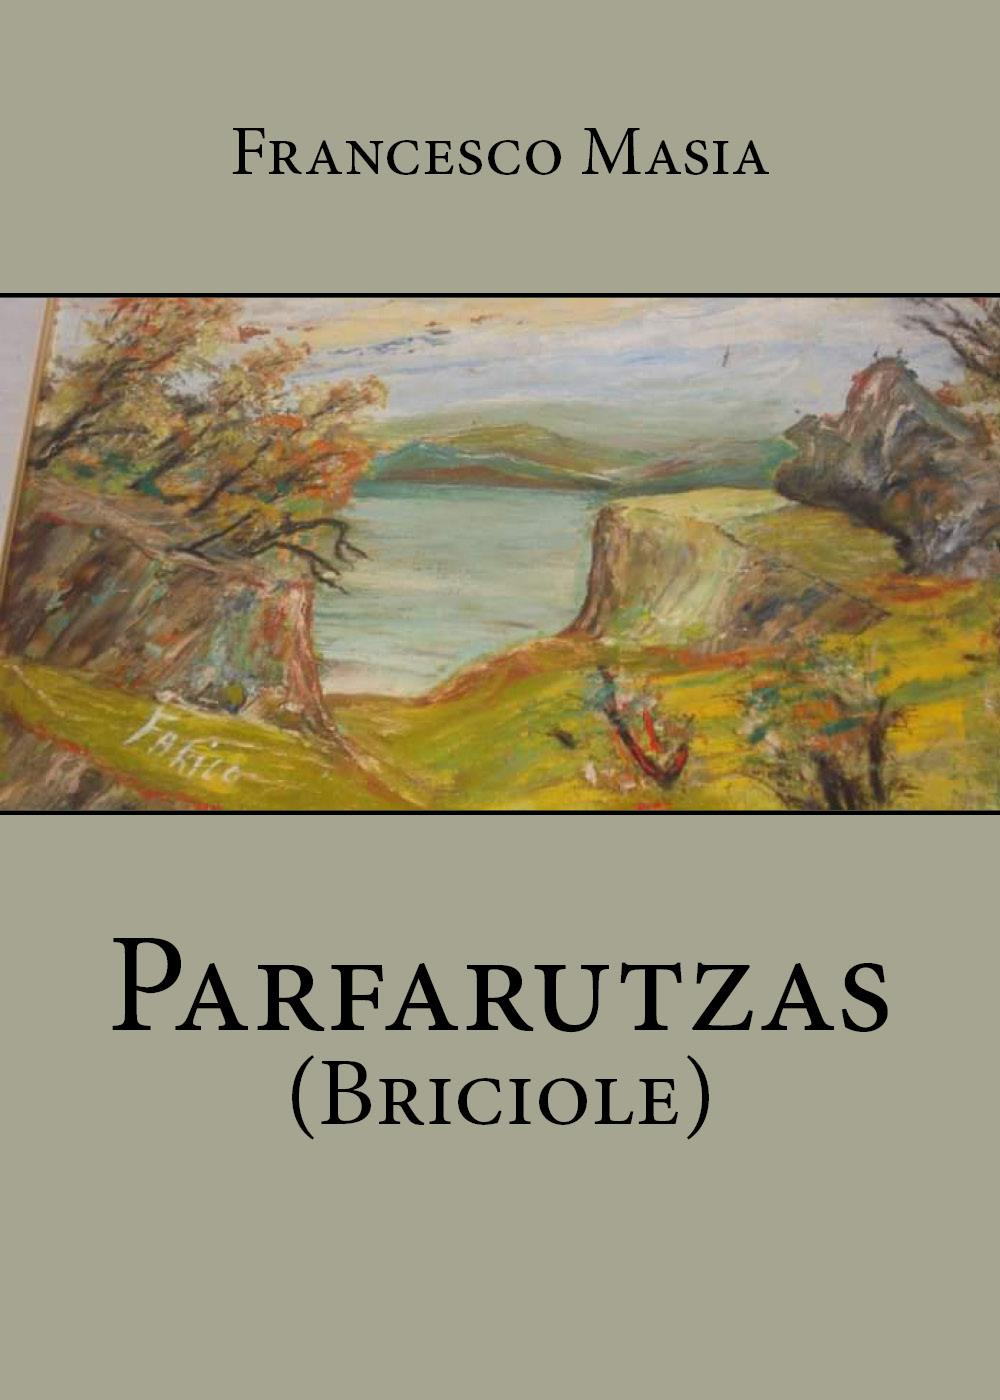 Parfarutzas